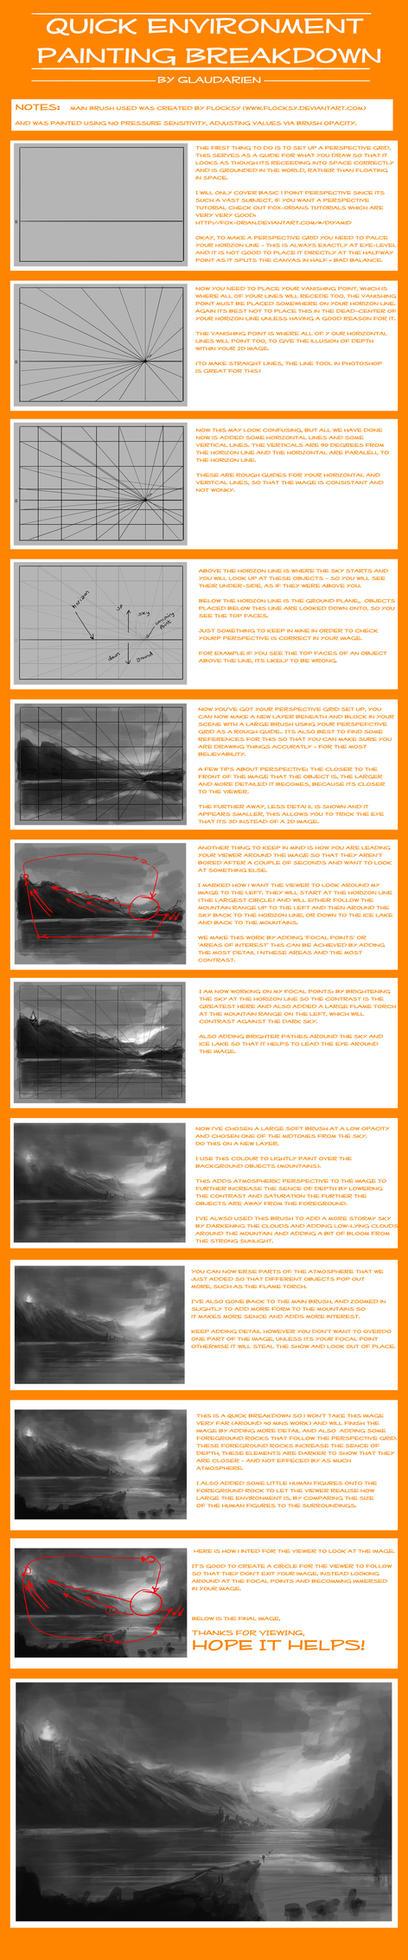 Quick Environment Breakdown by JackEavesArt